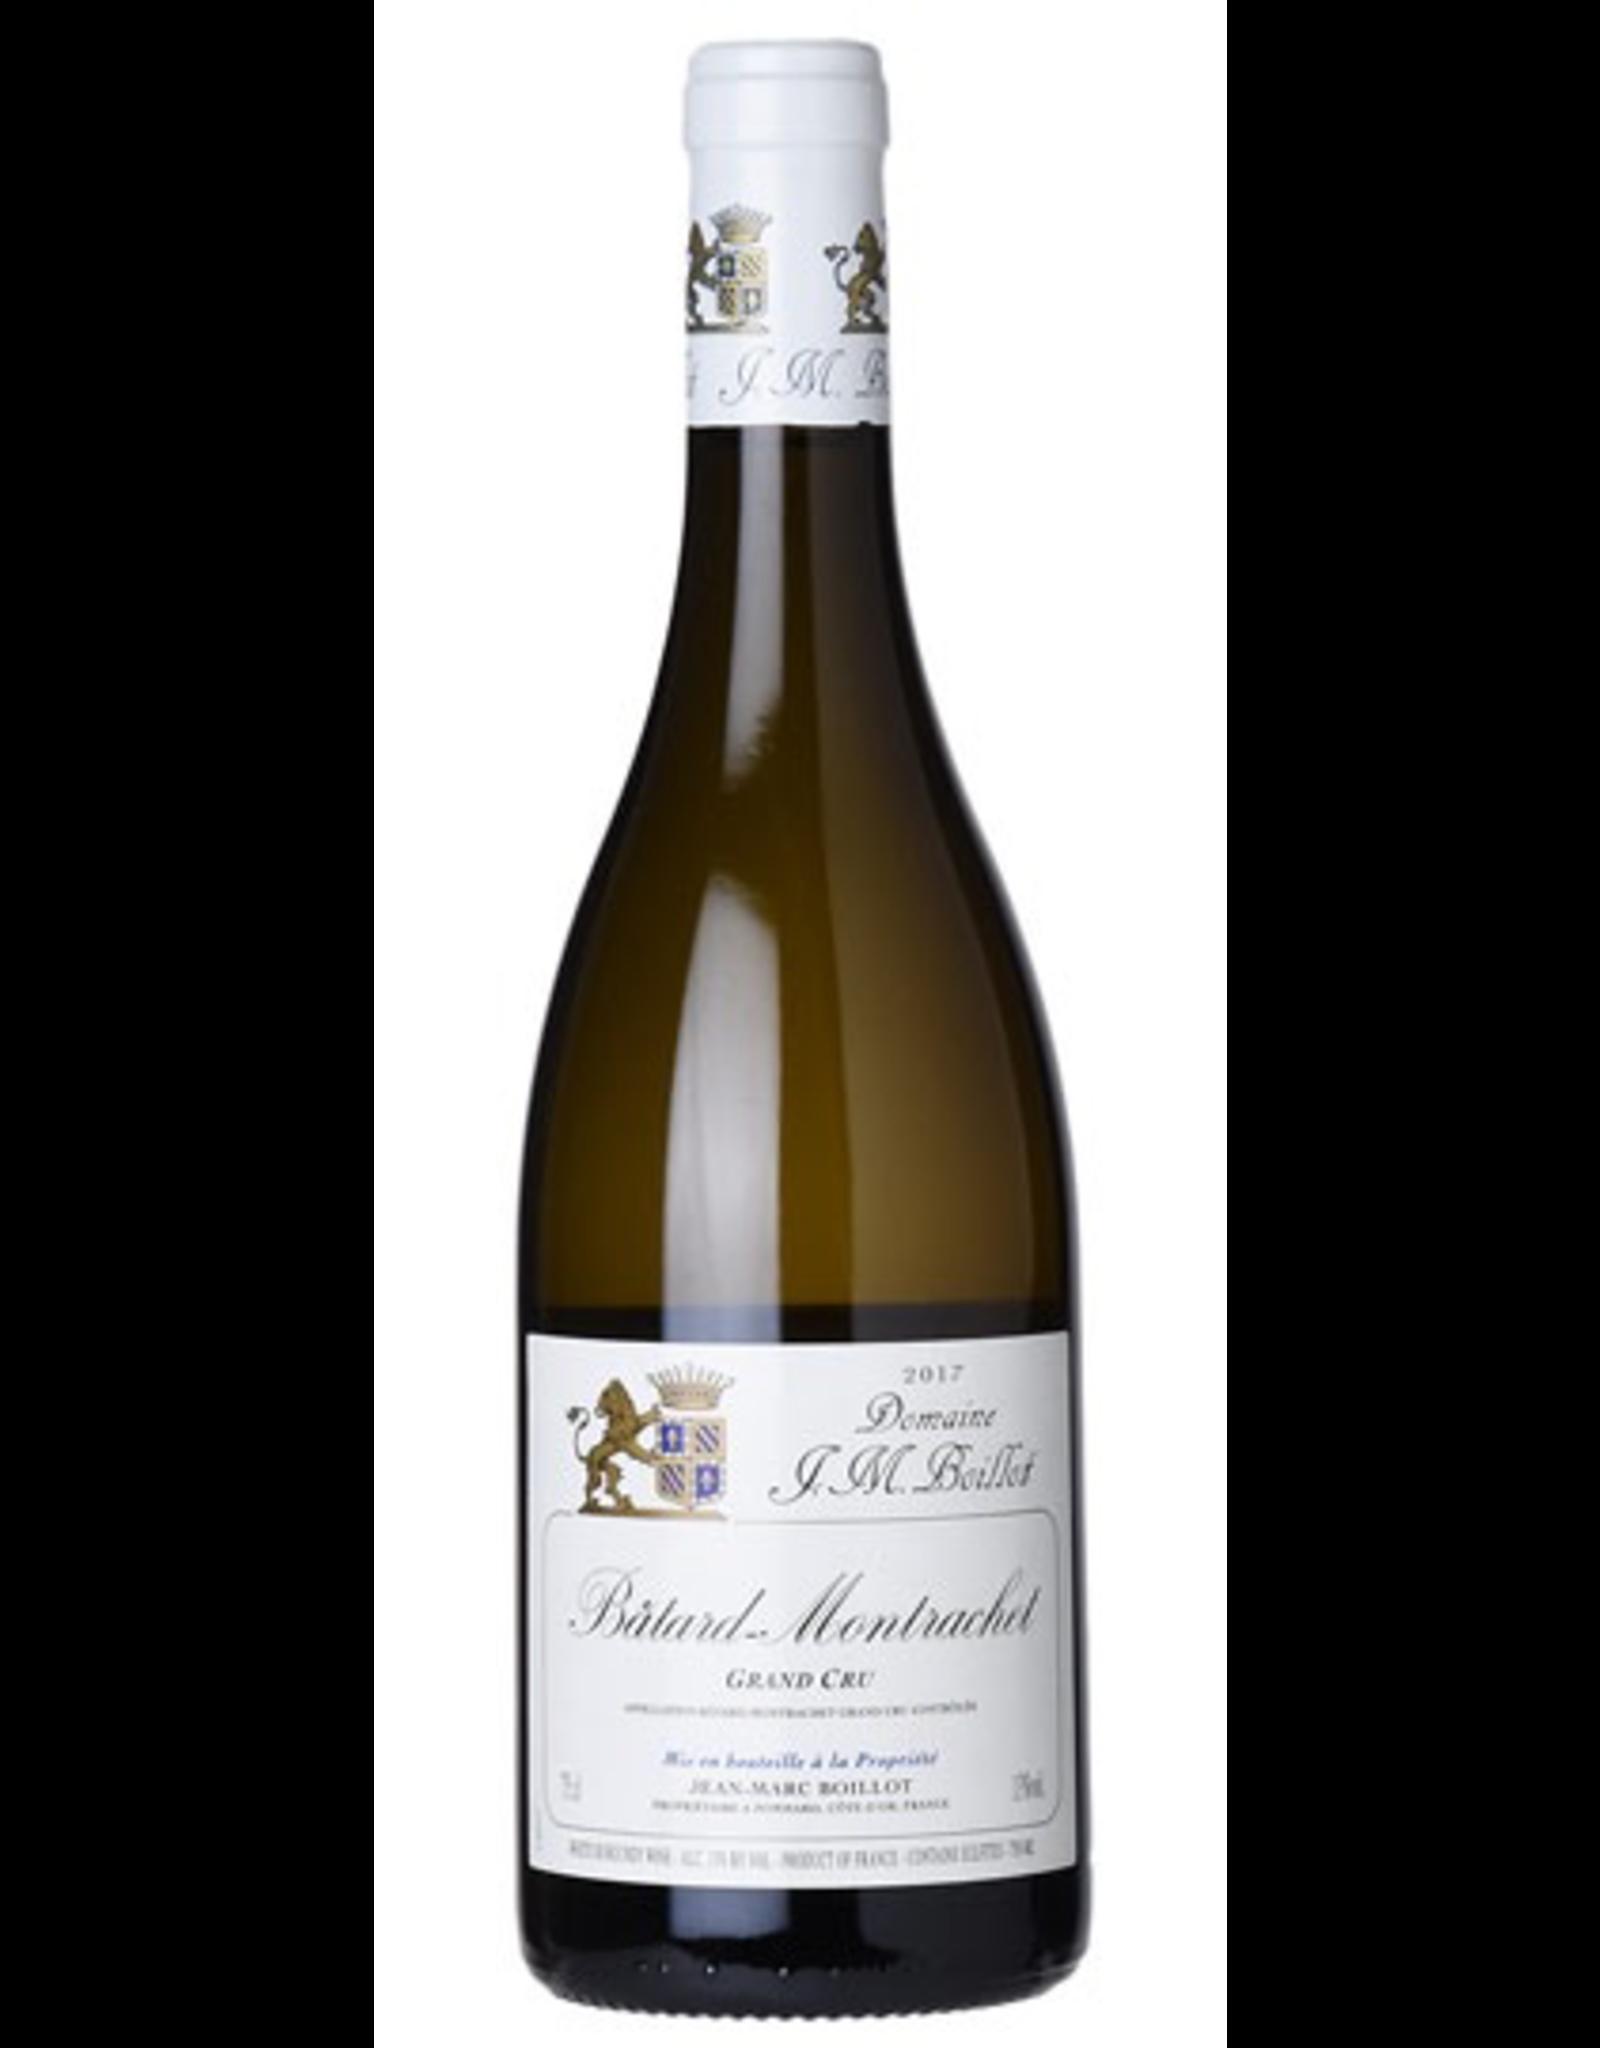 White Wine 2018, J.M. Boillot Batard-Montrachet Grand Cru, Chardonnay, Batard-Montrachet, Burgundy, France, 13% Alc, CTnr